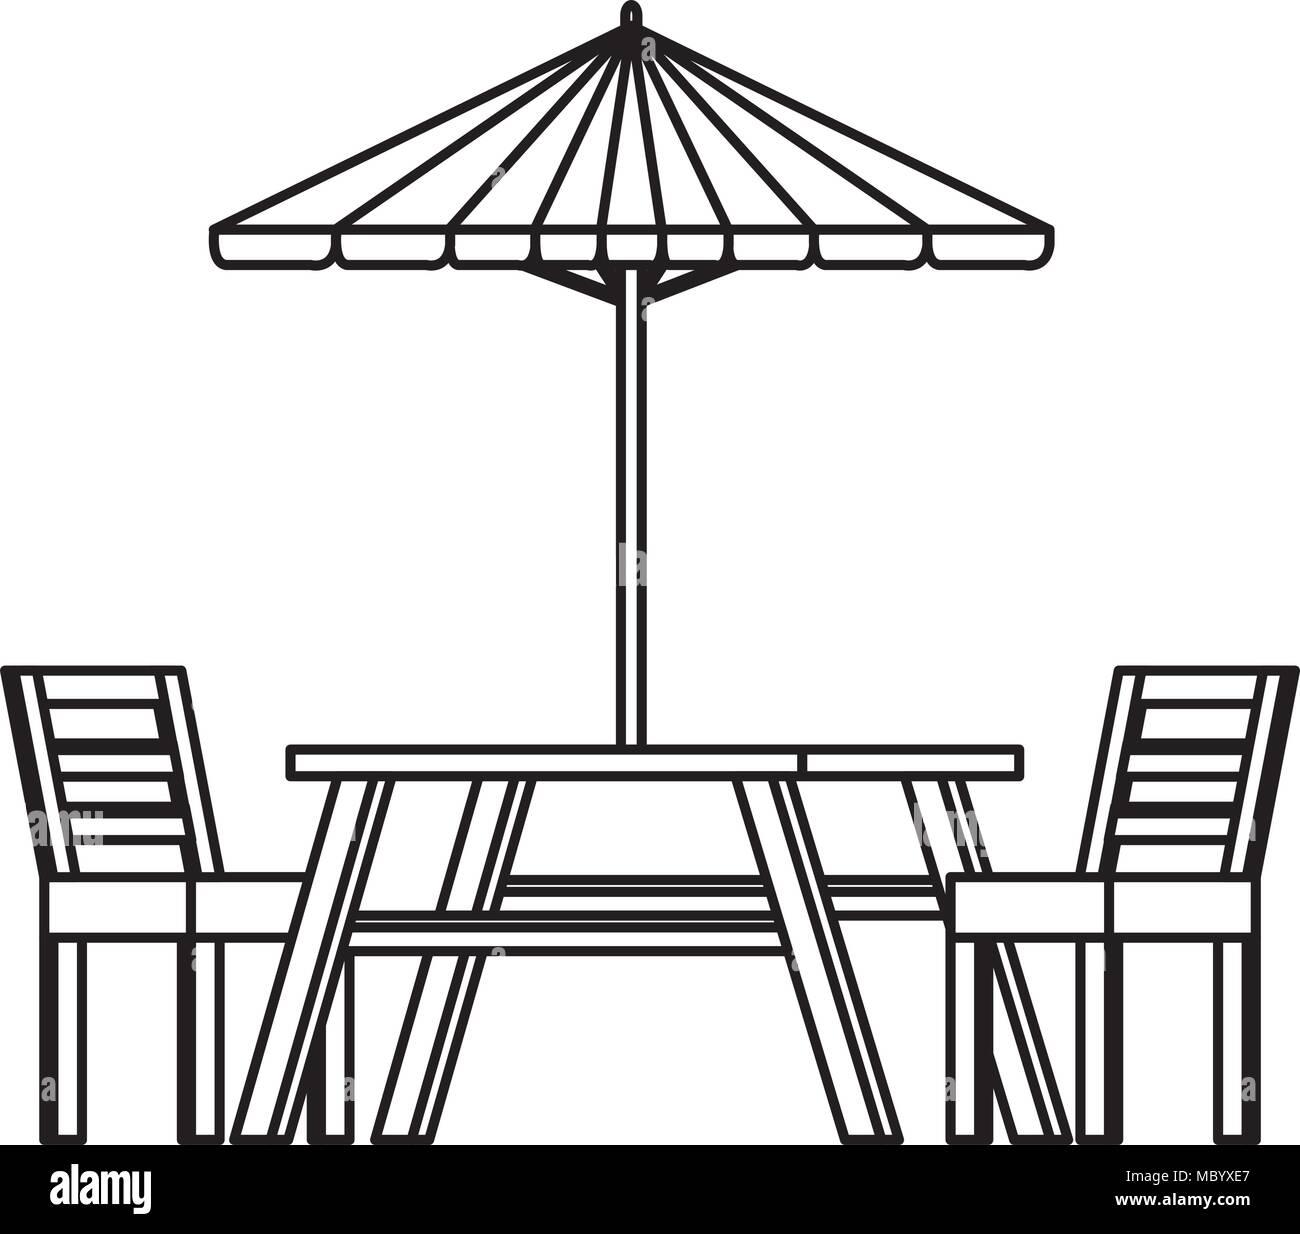 Picnic Table With Umbrella   Stock Image